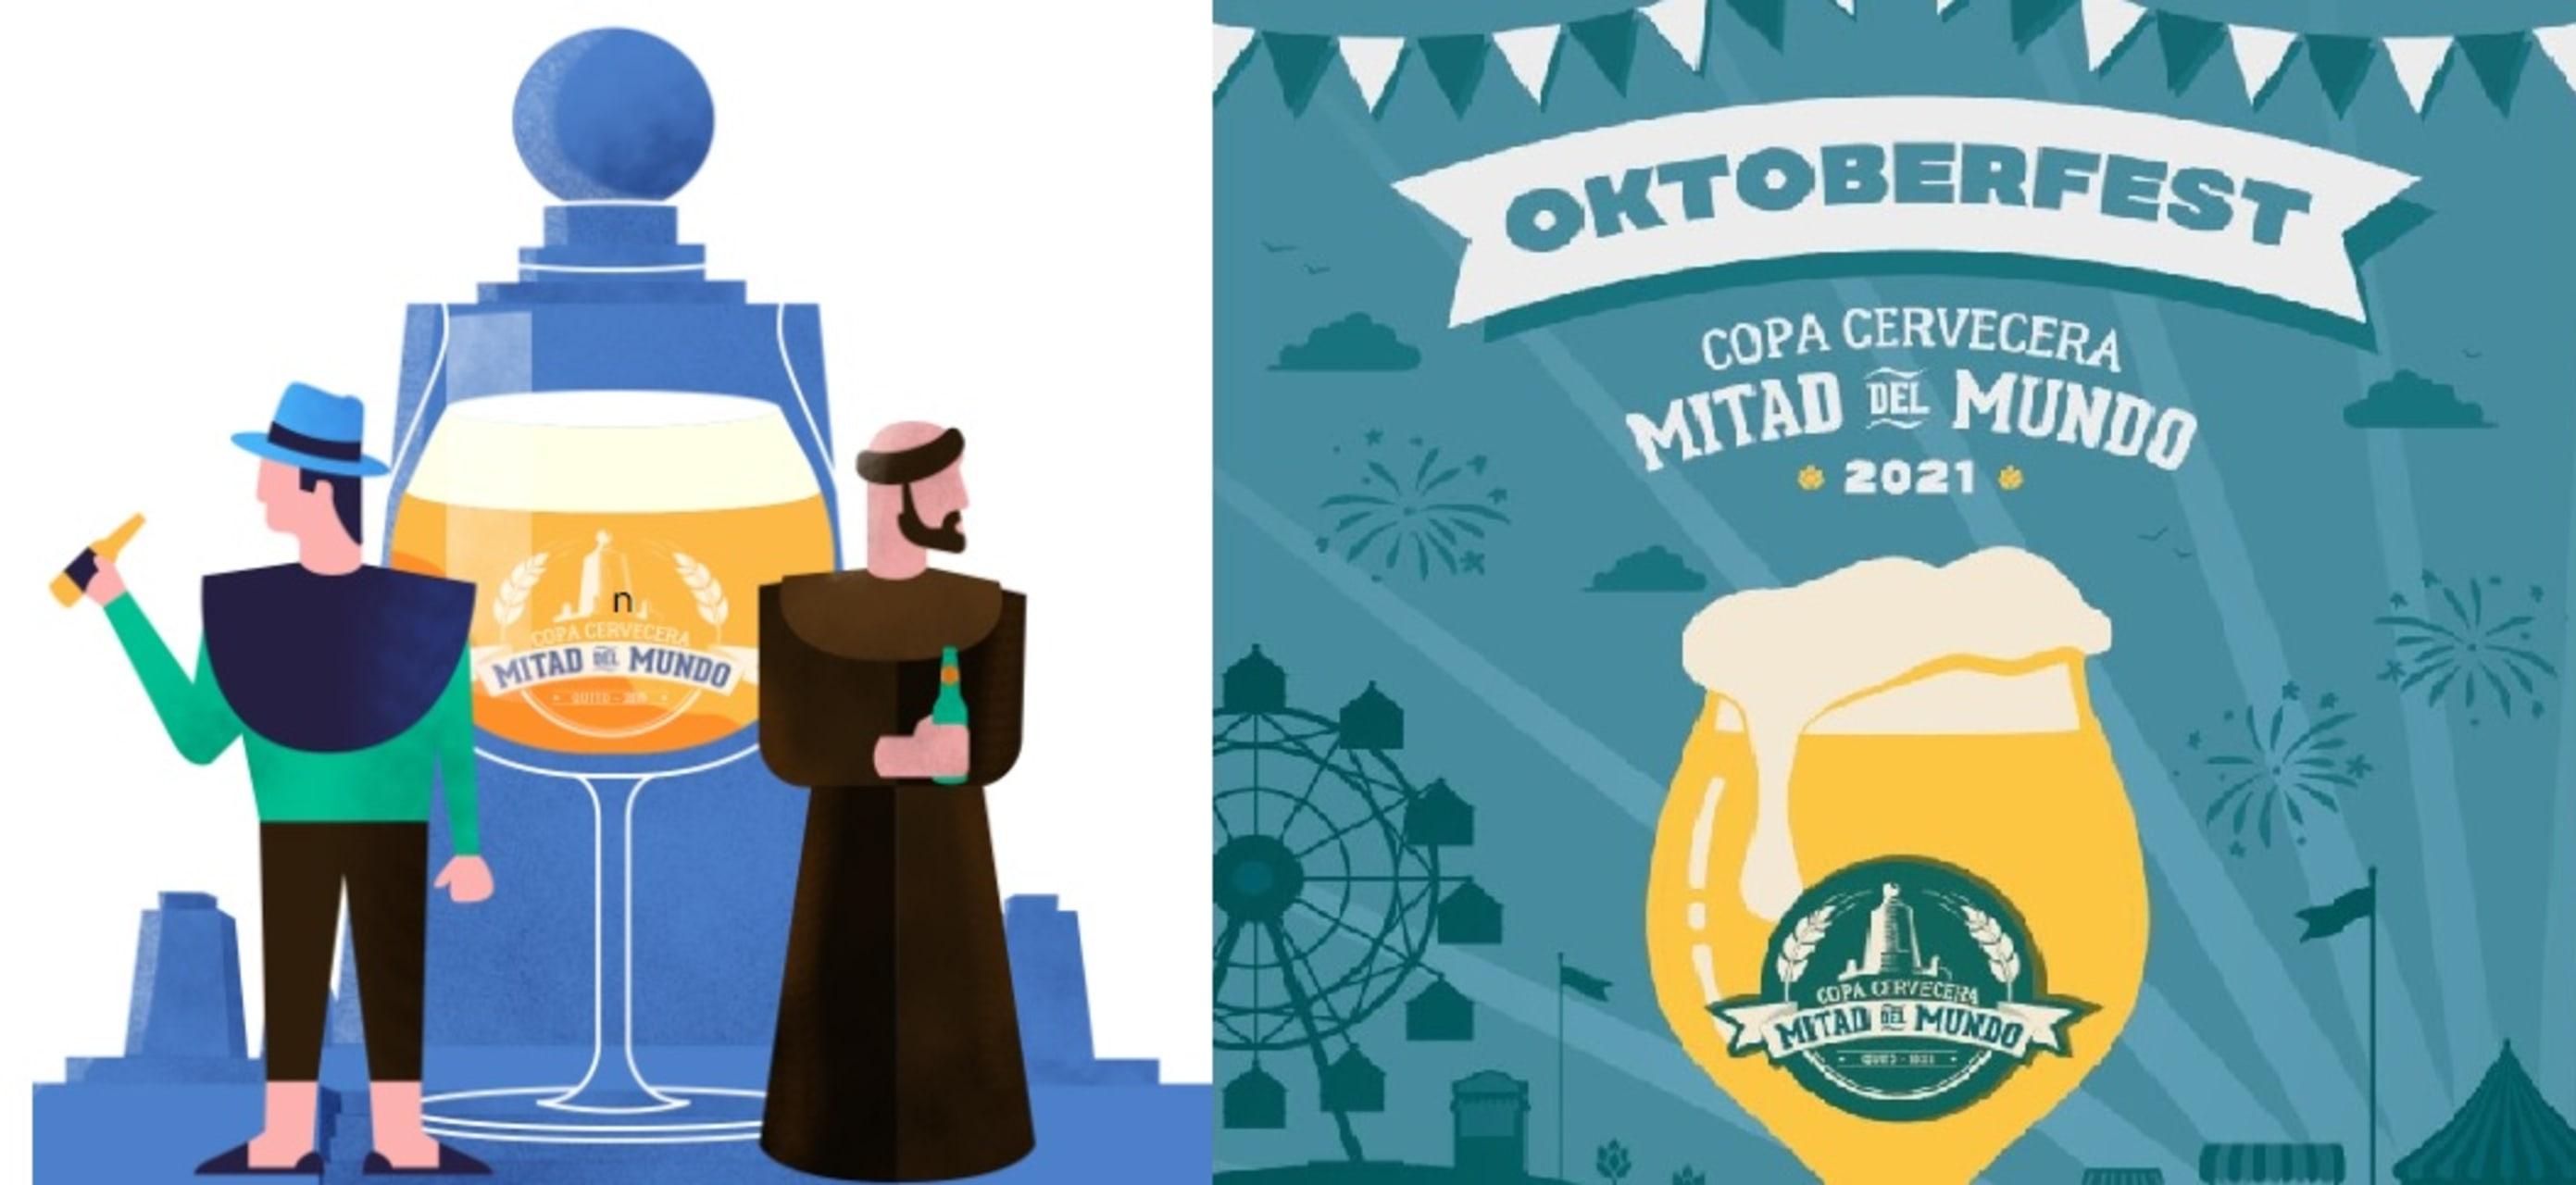 Quito - How do we Celebrate the Oktoberfest in Ecuador?